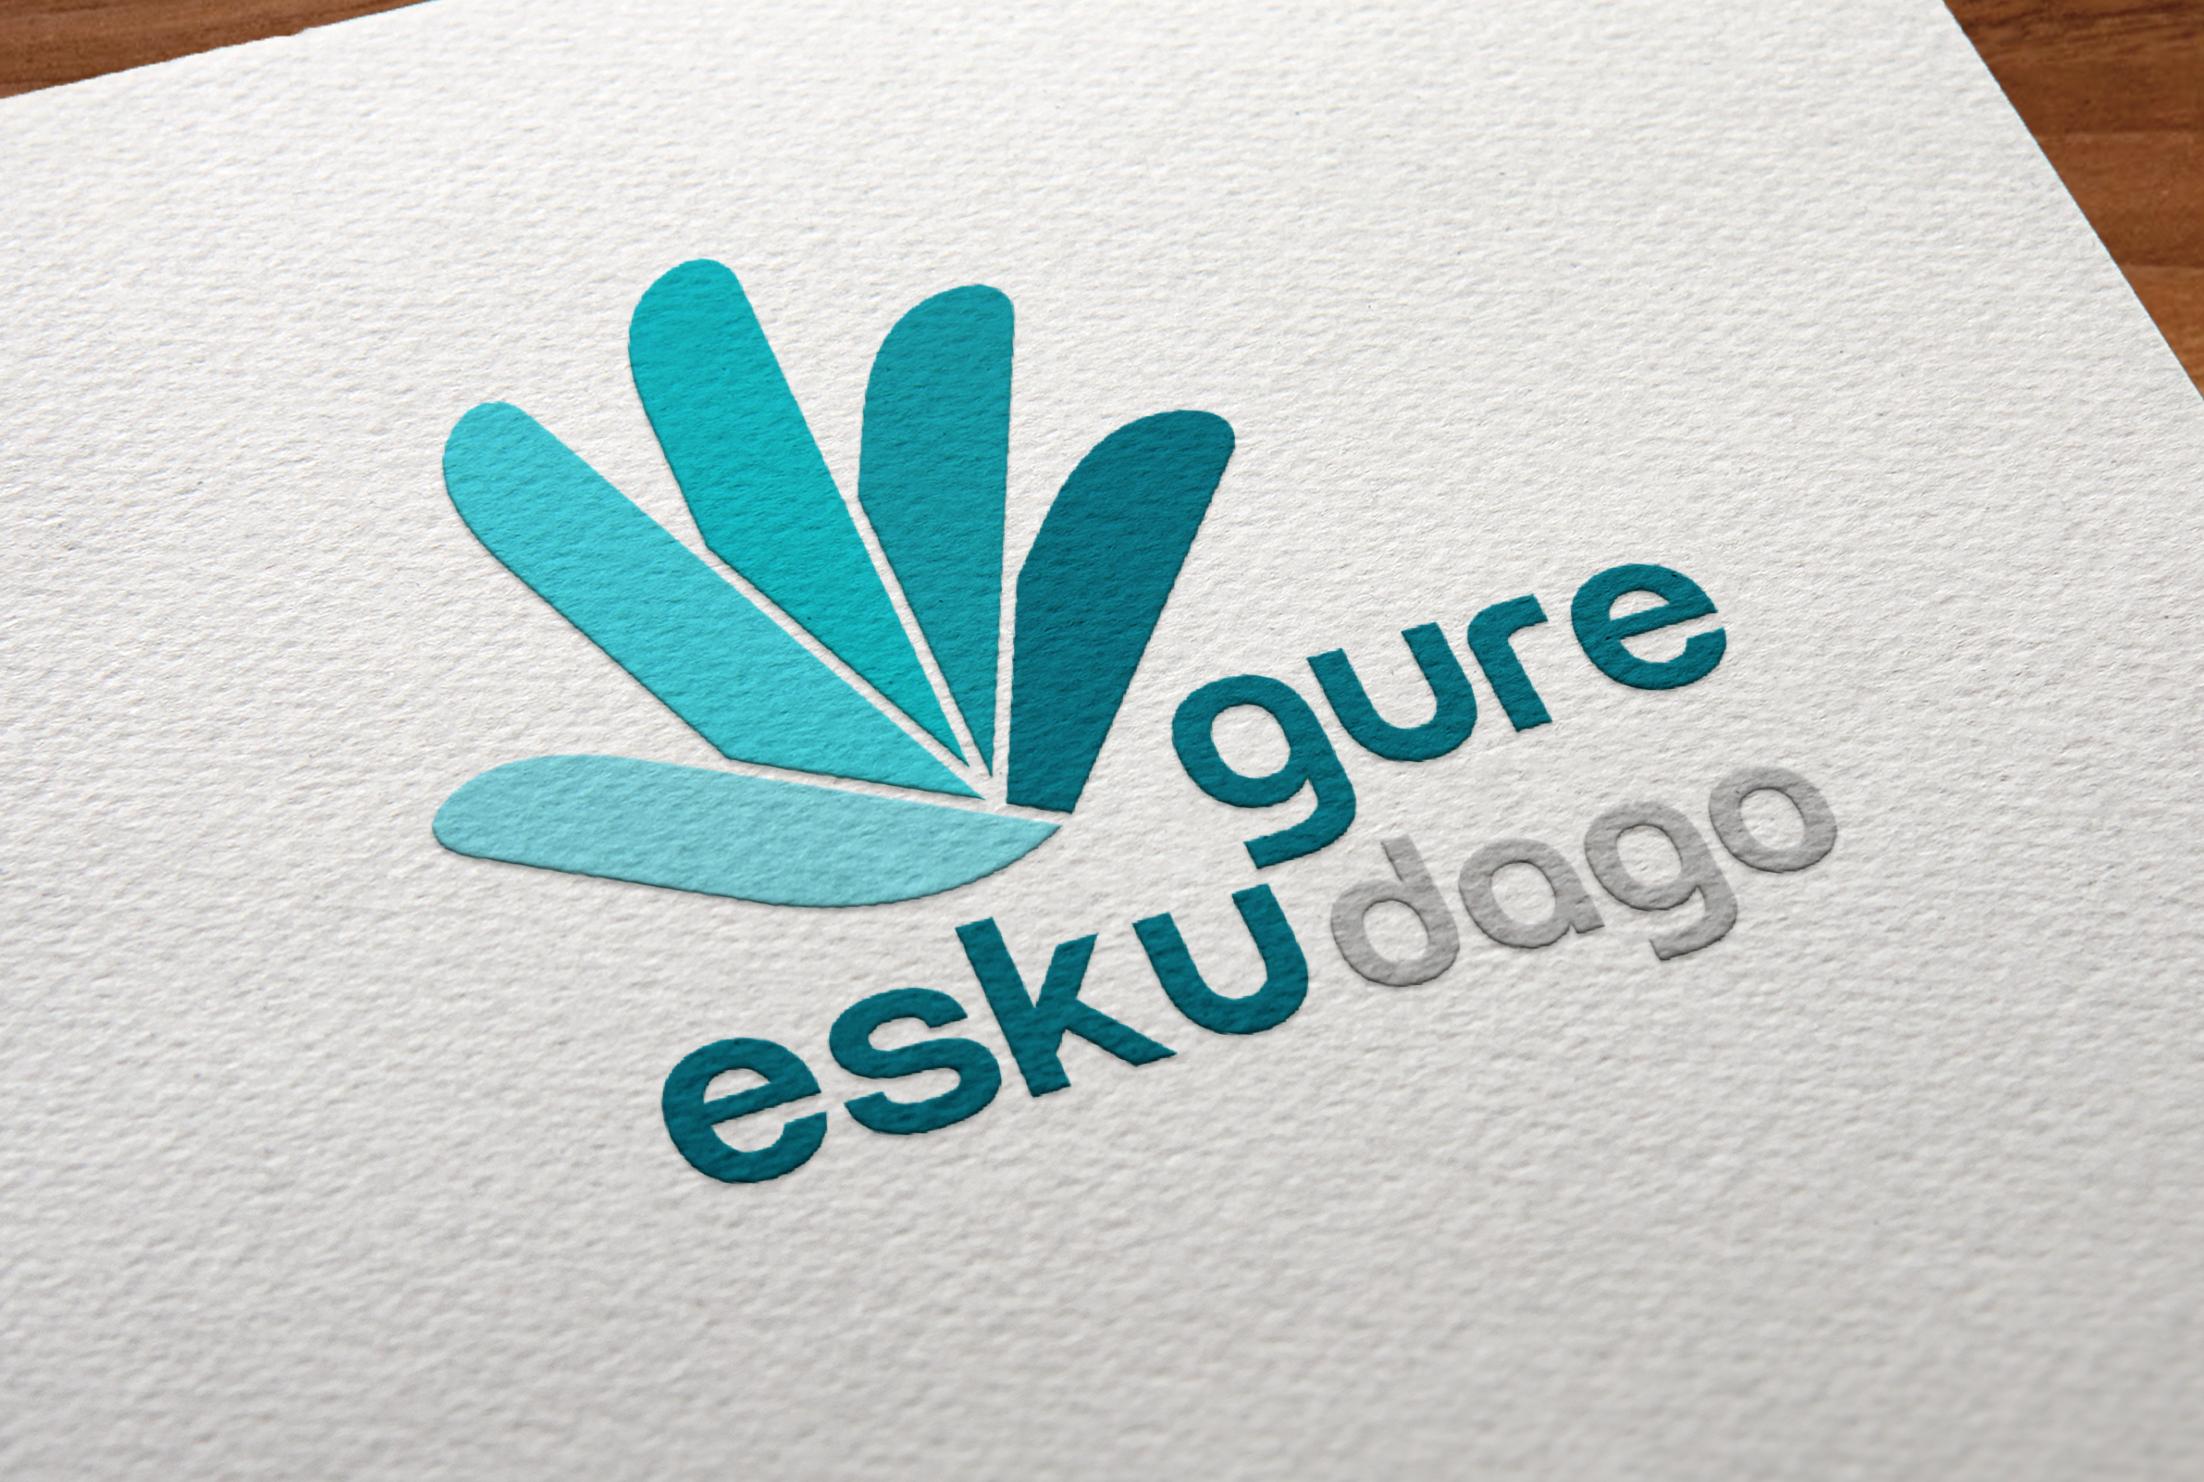 GURE ESKU DAGO rediseño del logotipo